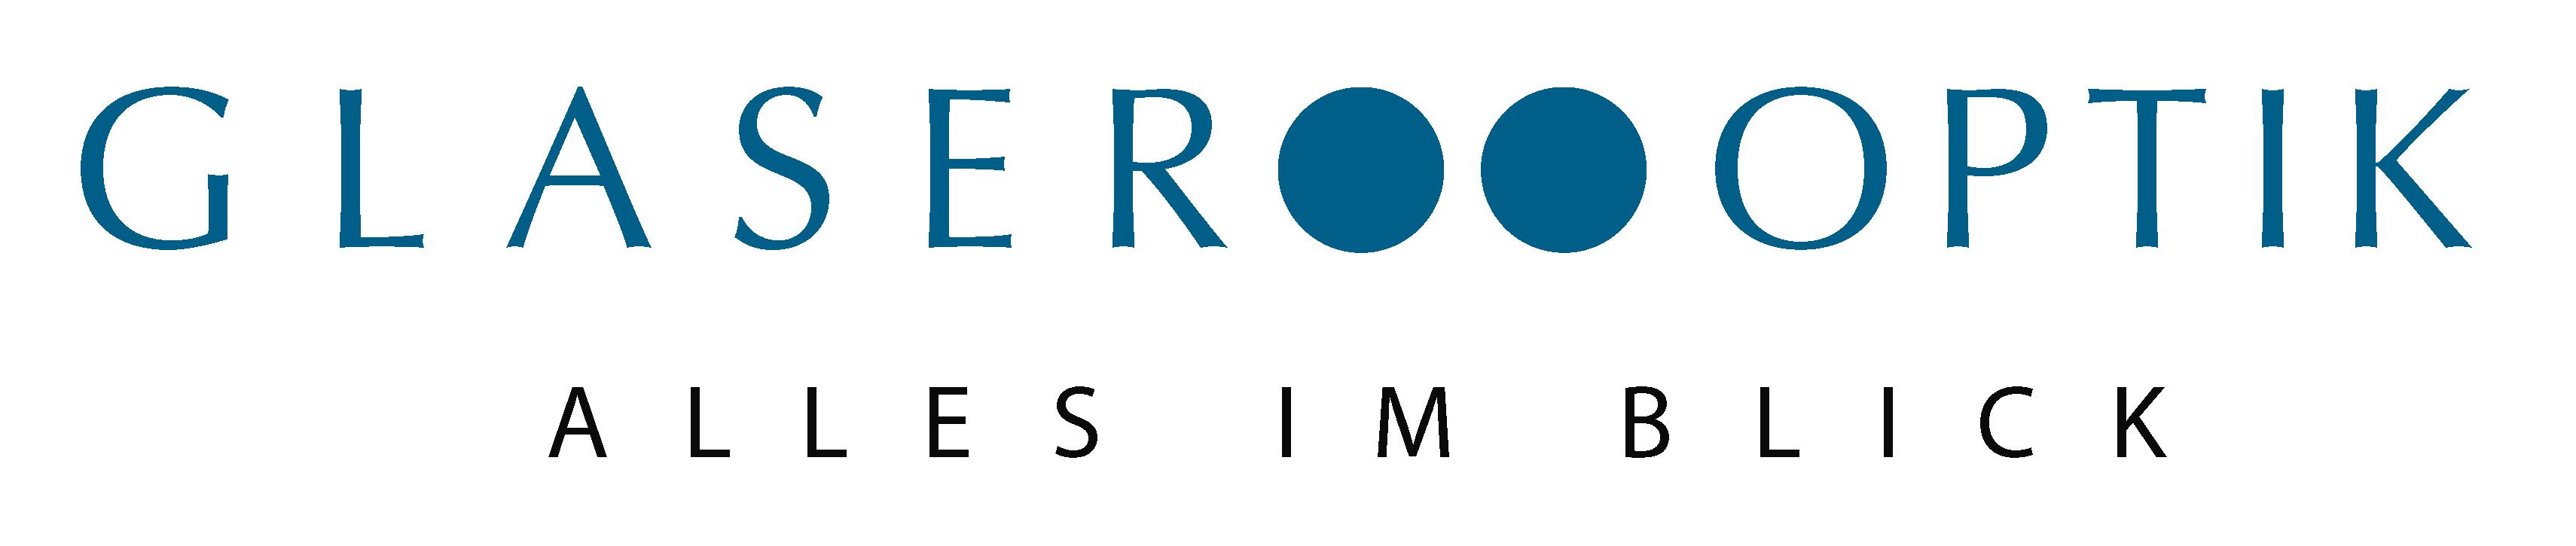 Logo Glaser Optik